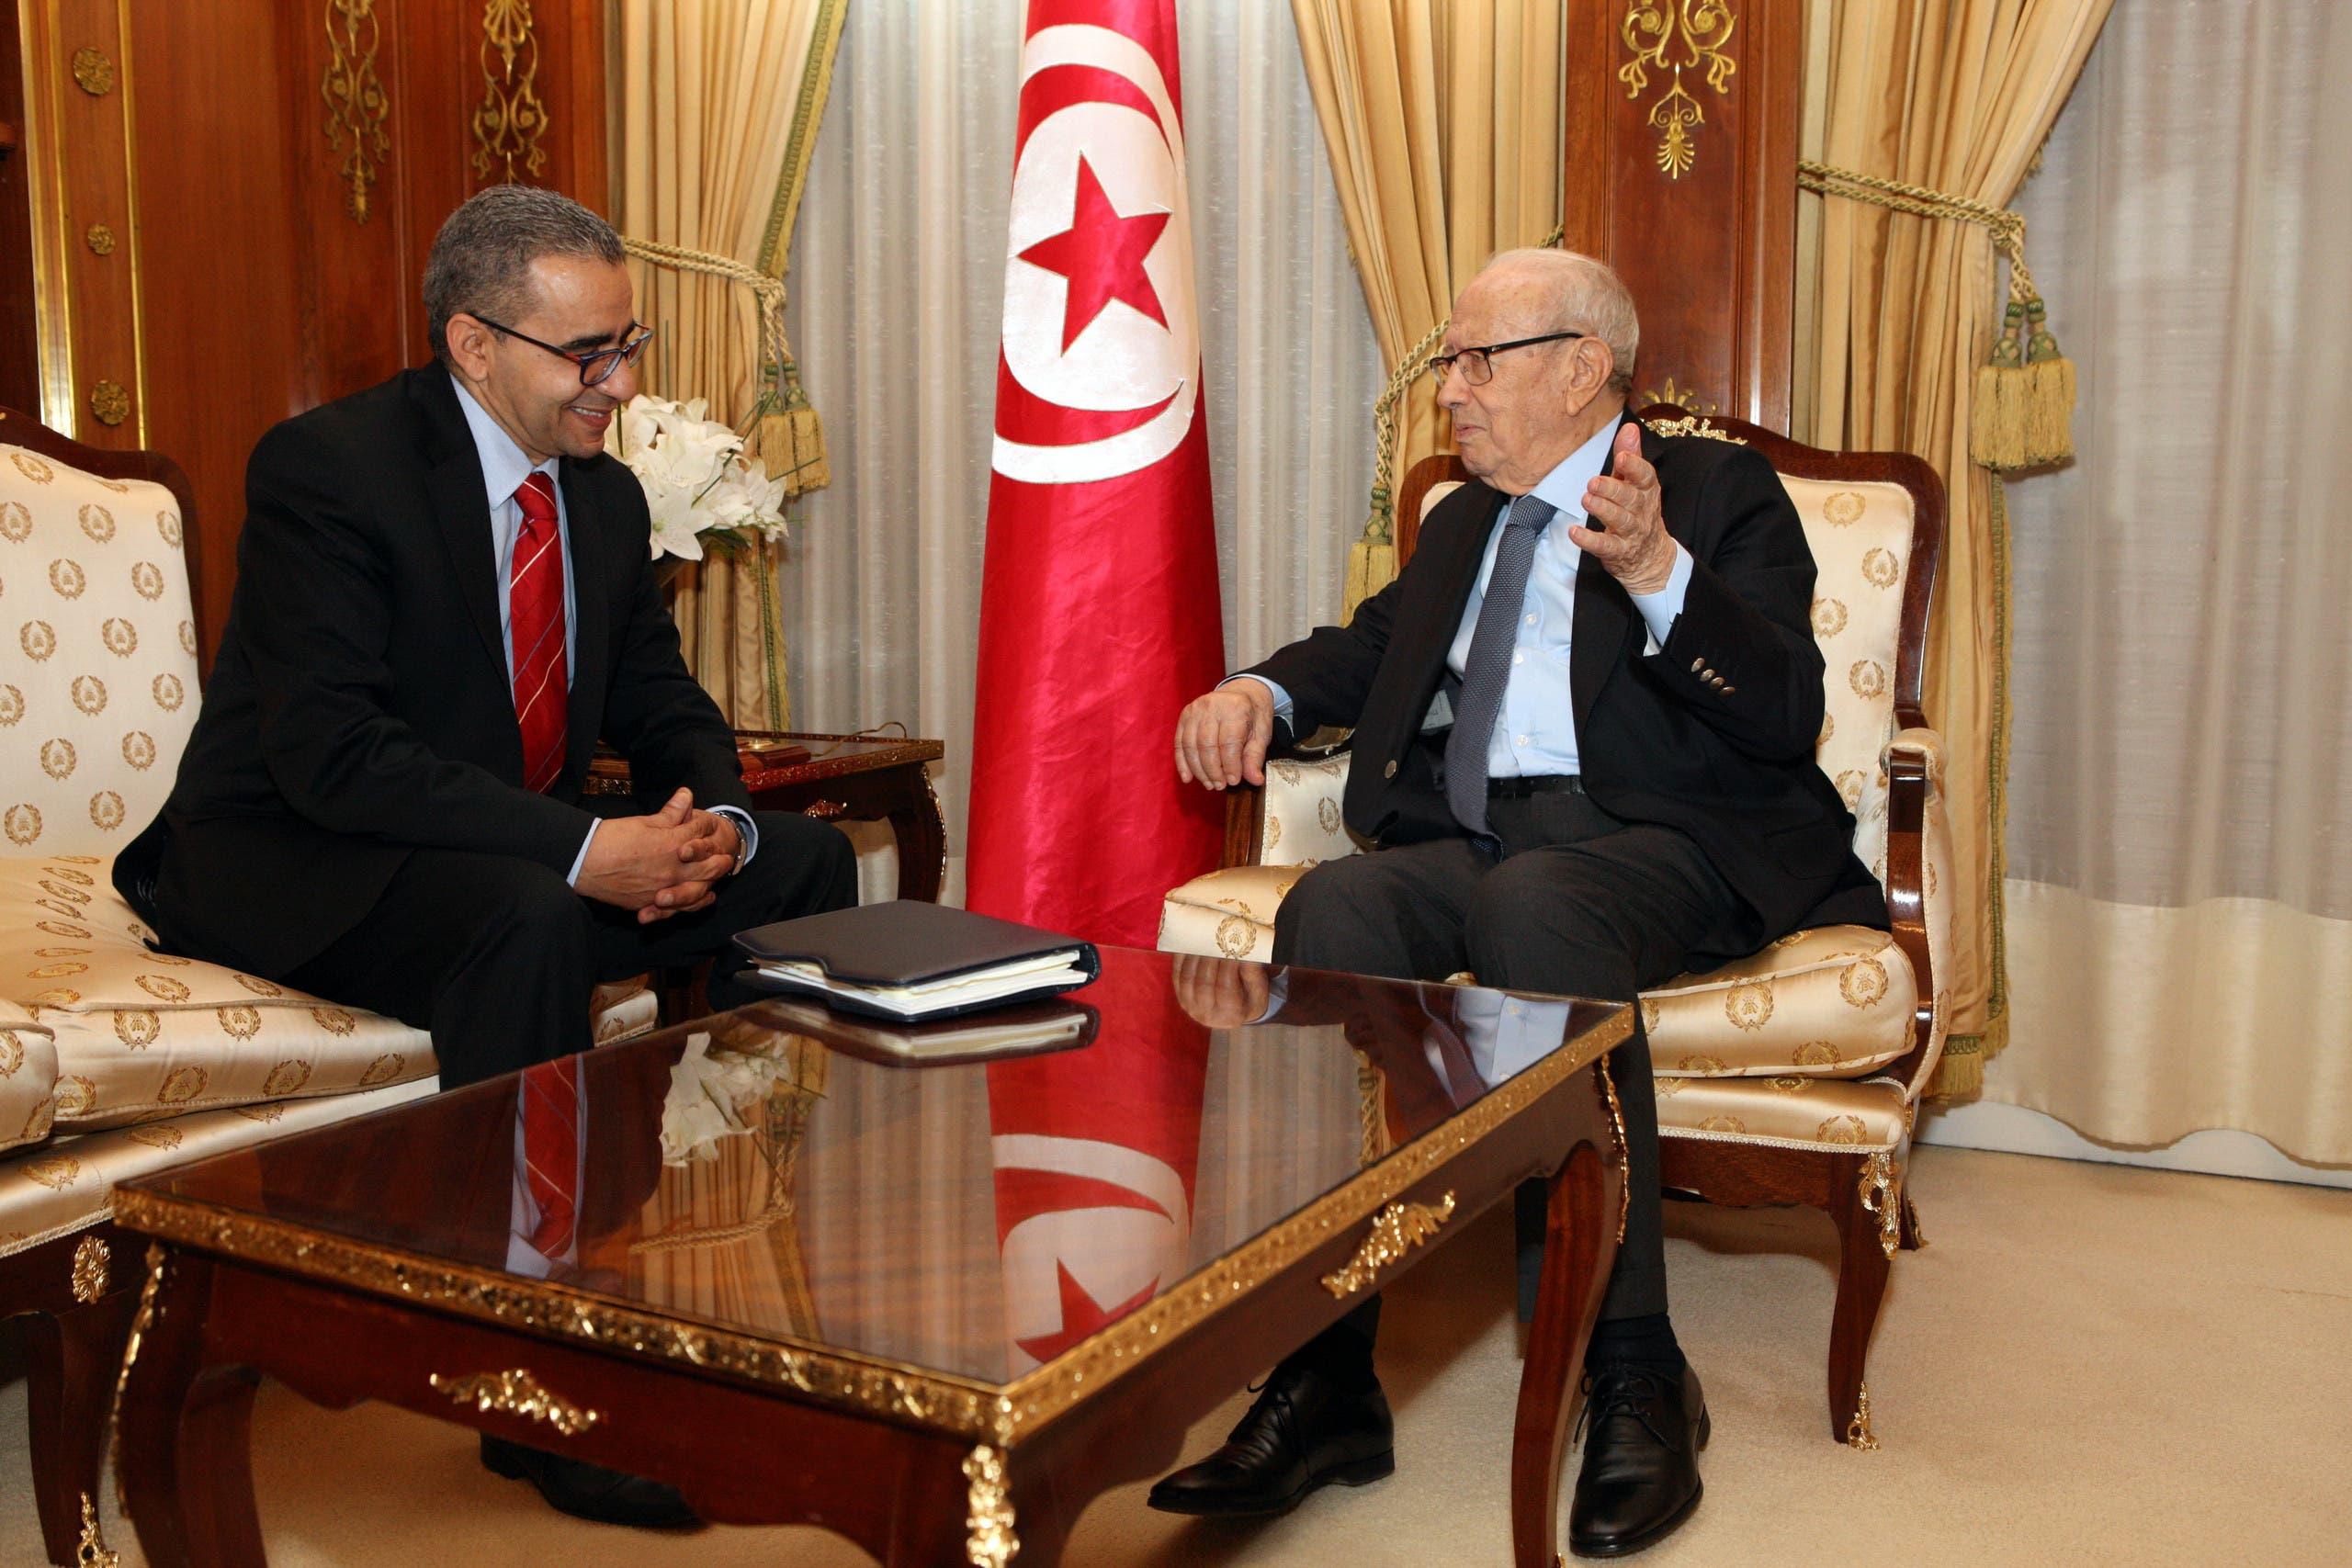 Tunisian President Beji Caid Essebsi sits down with AlArabiya.Net's correspondent Mondher Bedhiafi. (Al Arabiya)